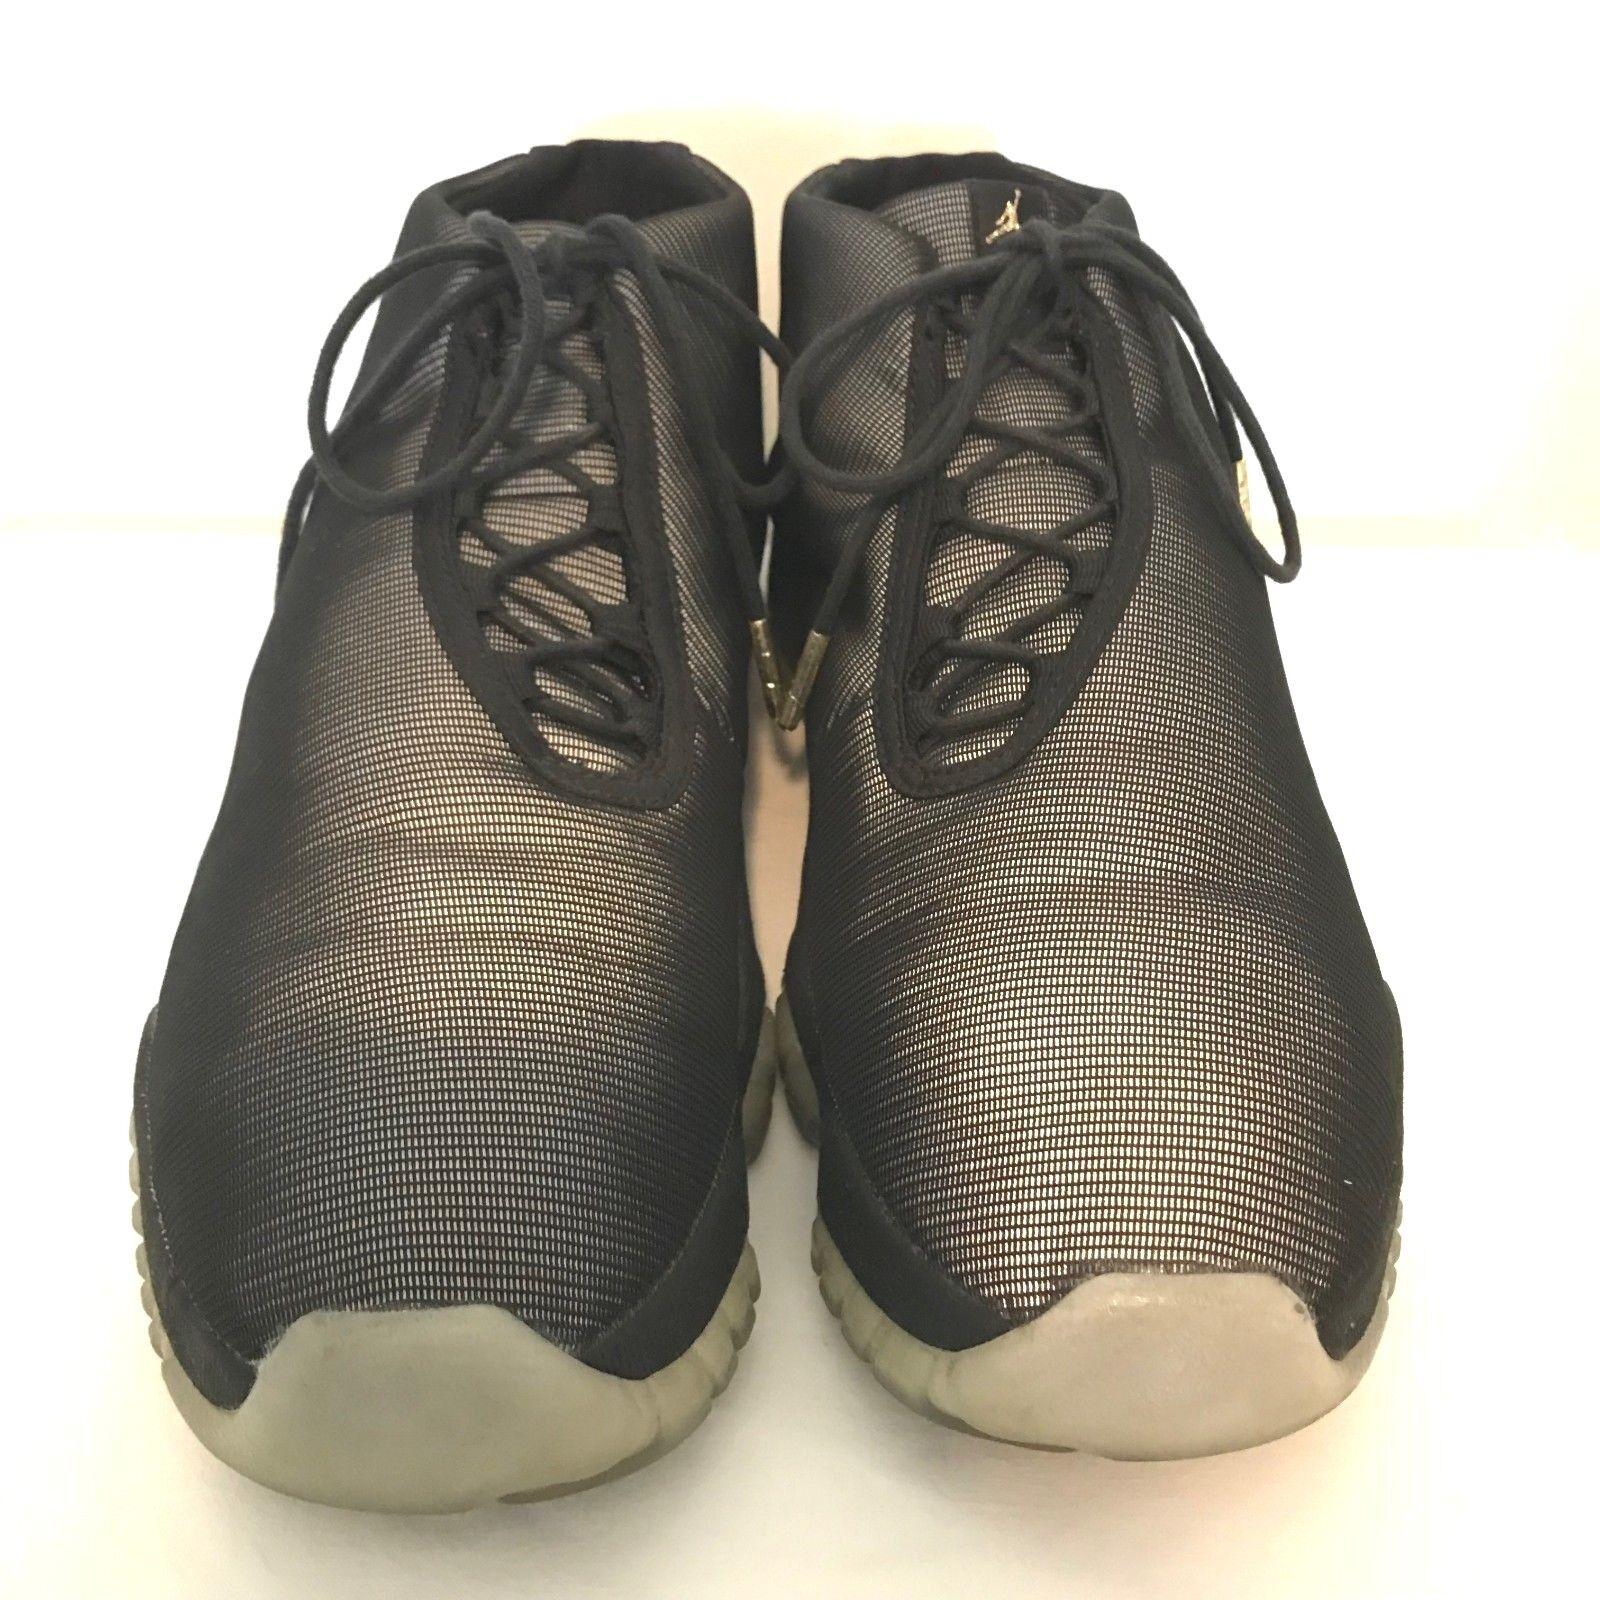 2014 - nike air jordan futuro 3m nero / chiara Uomo misura di scarpe 656503-011